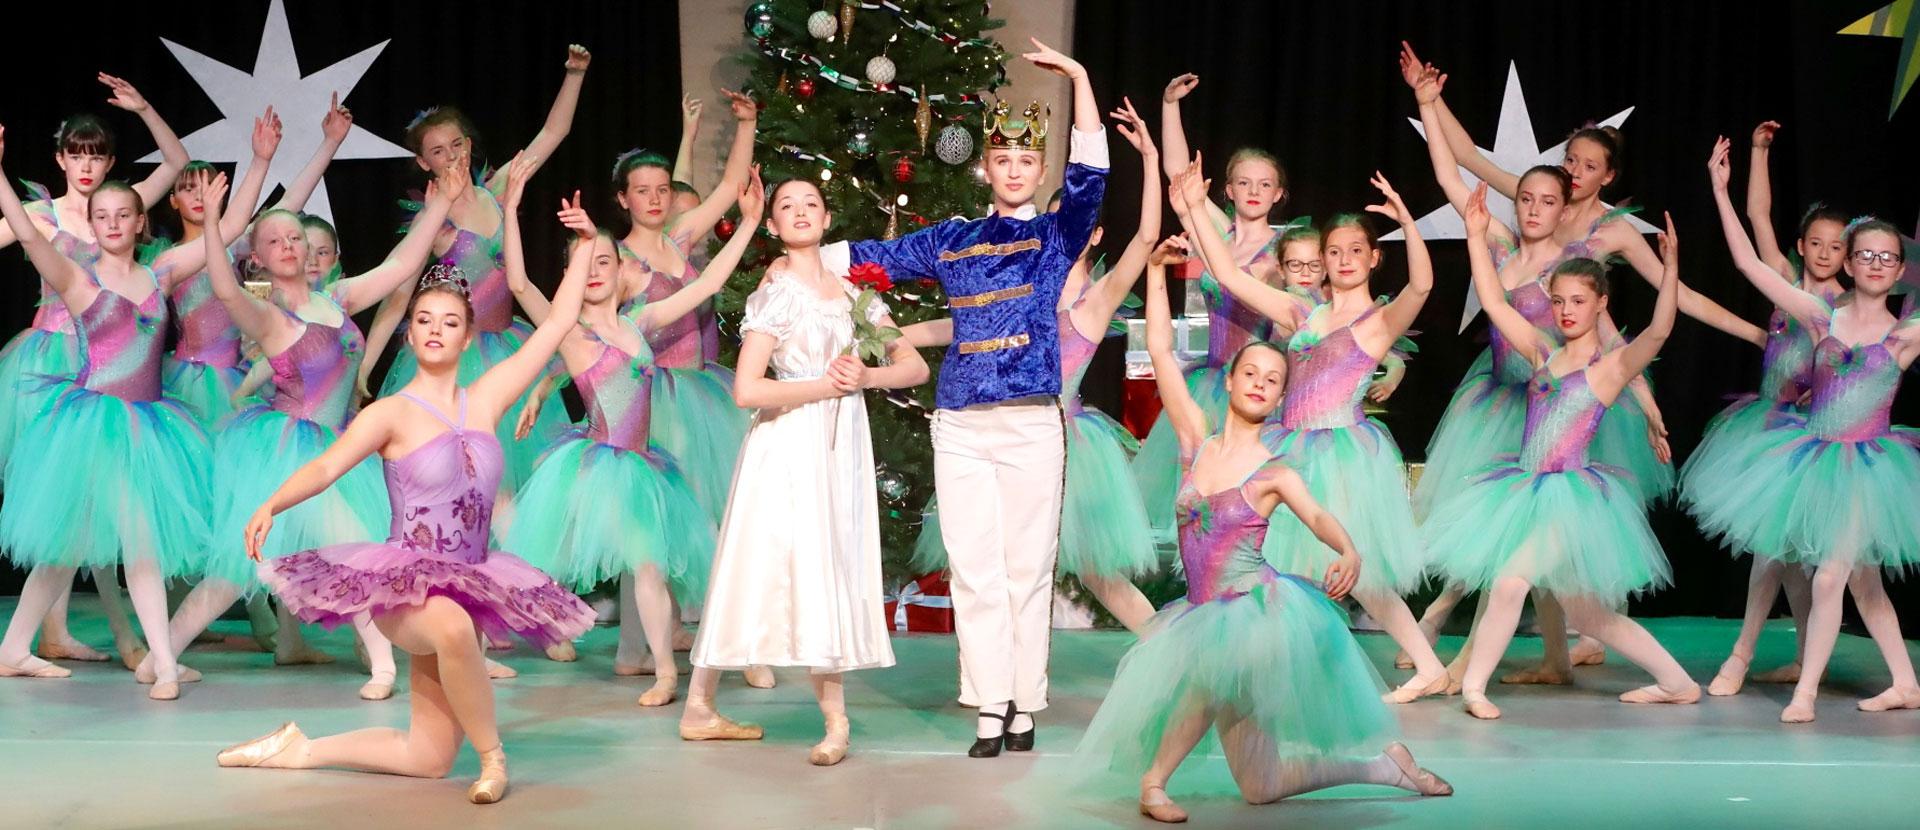 Nutcracker Ballet Production